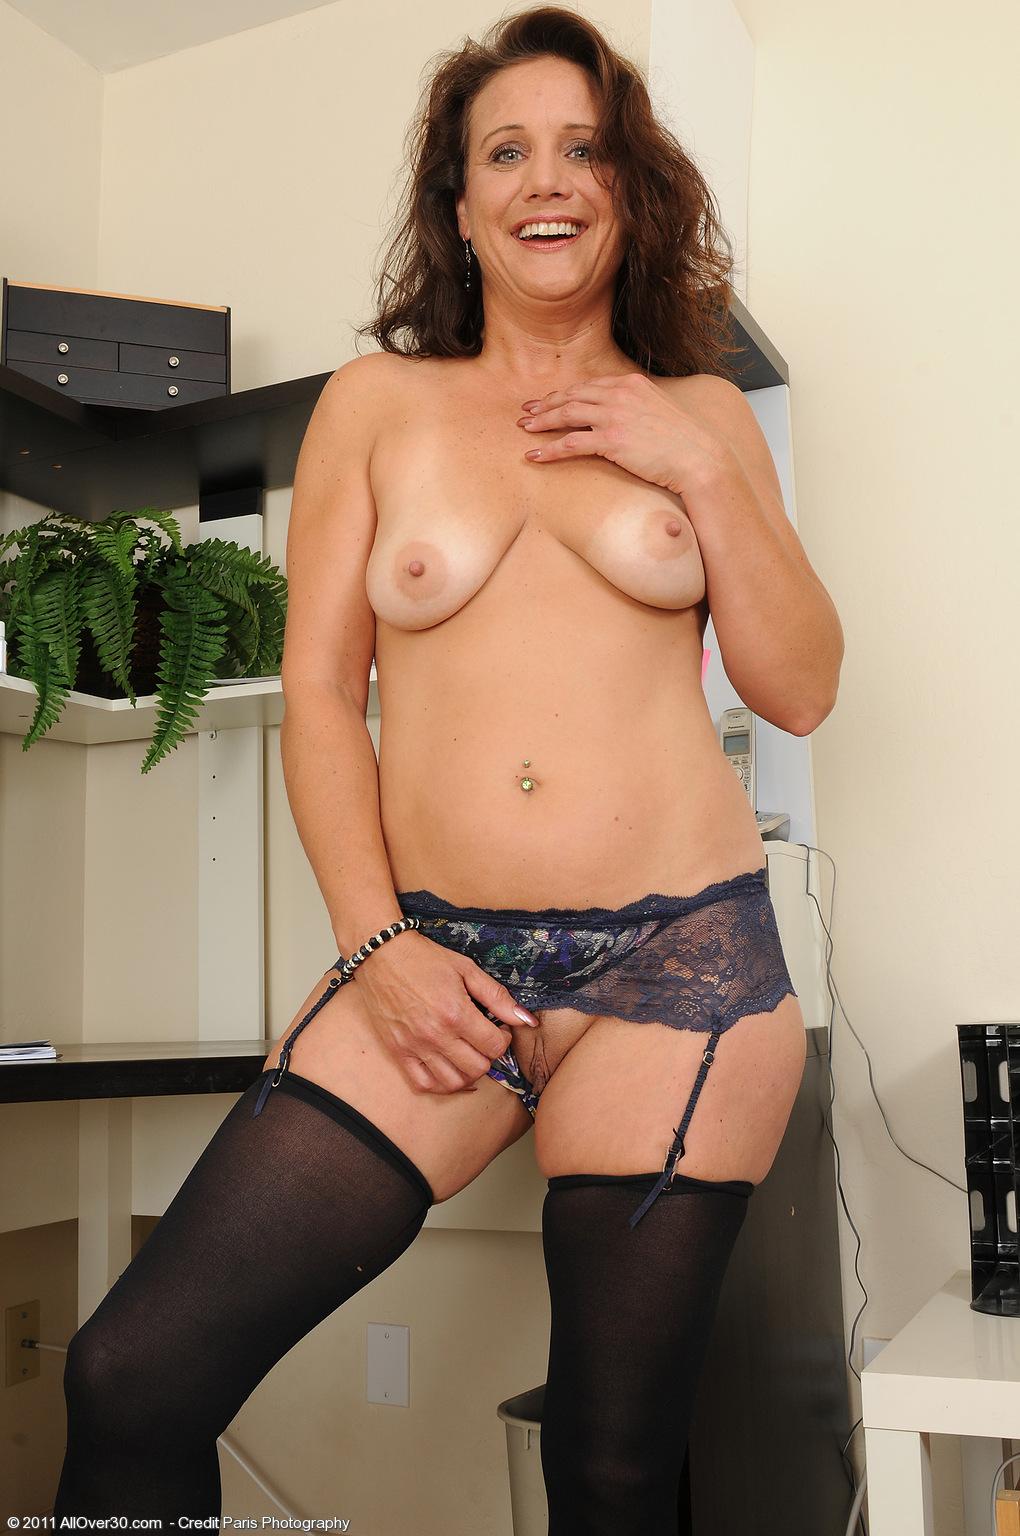 Free mature women in stockings